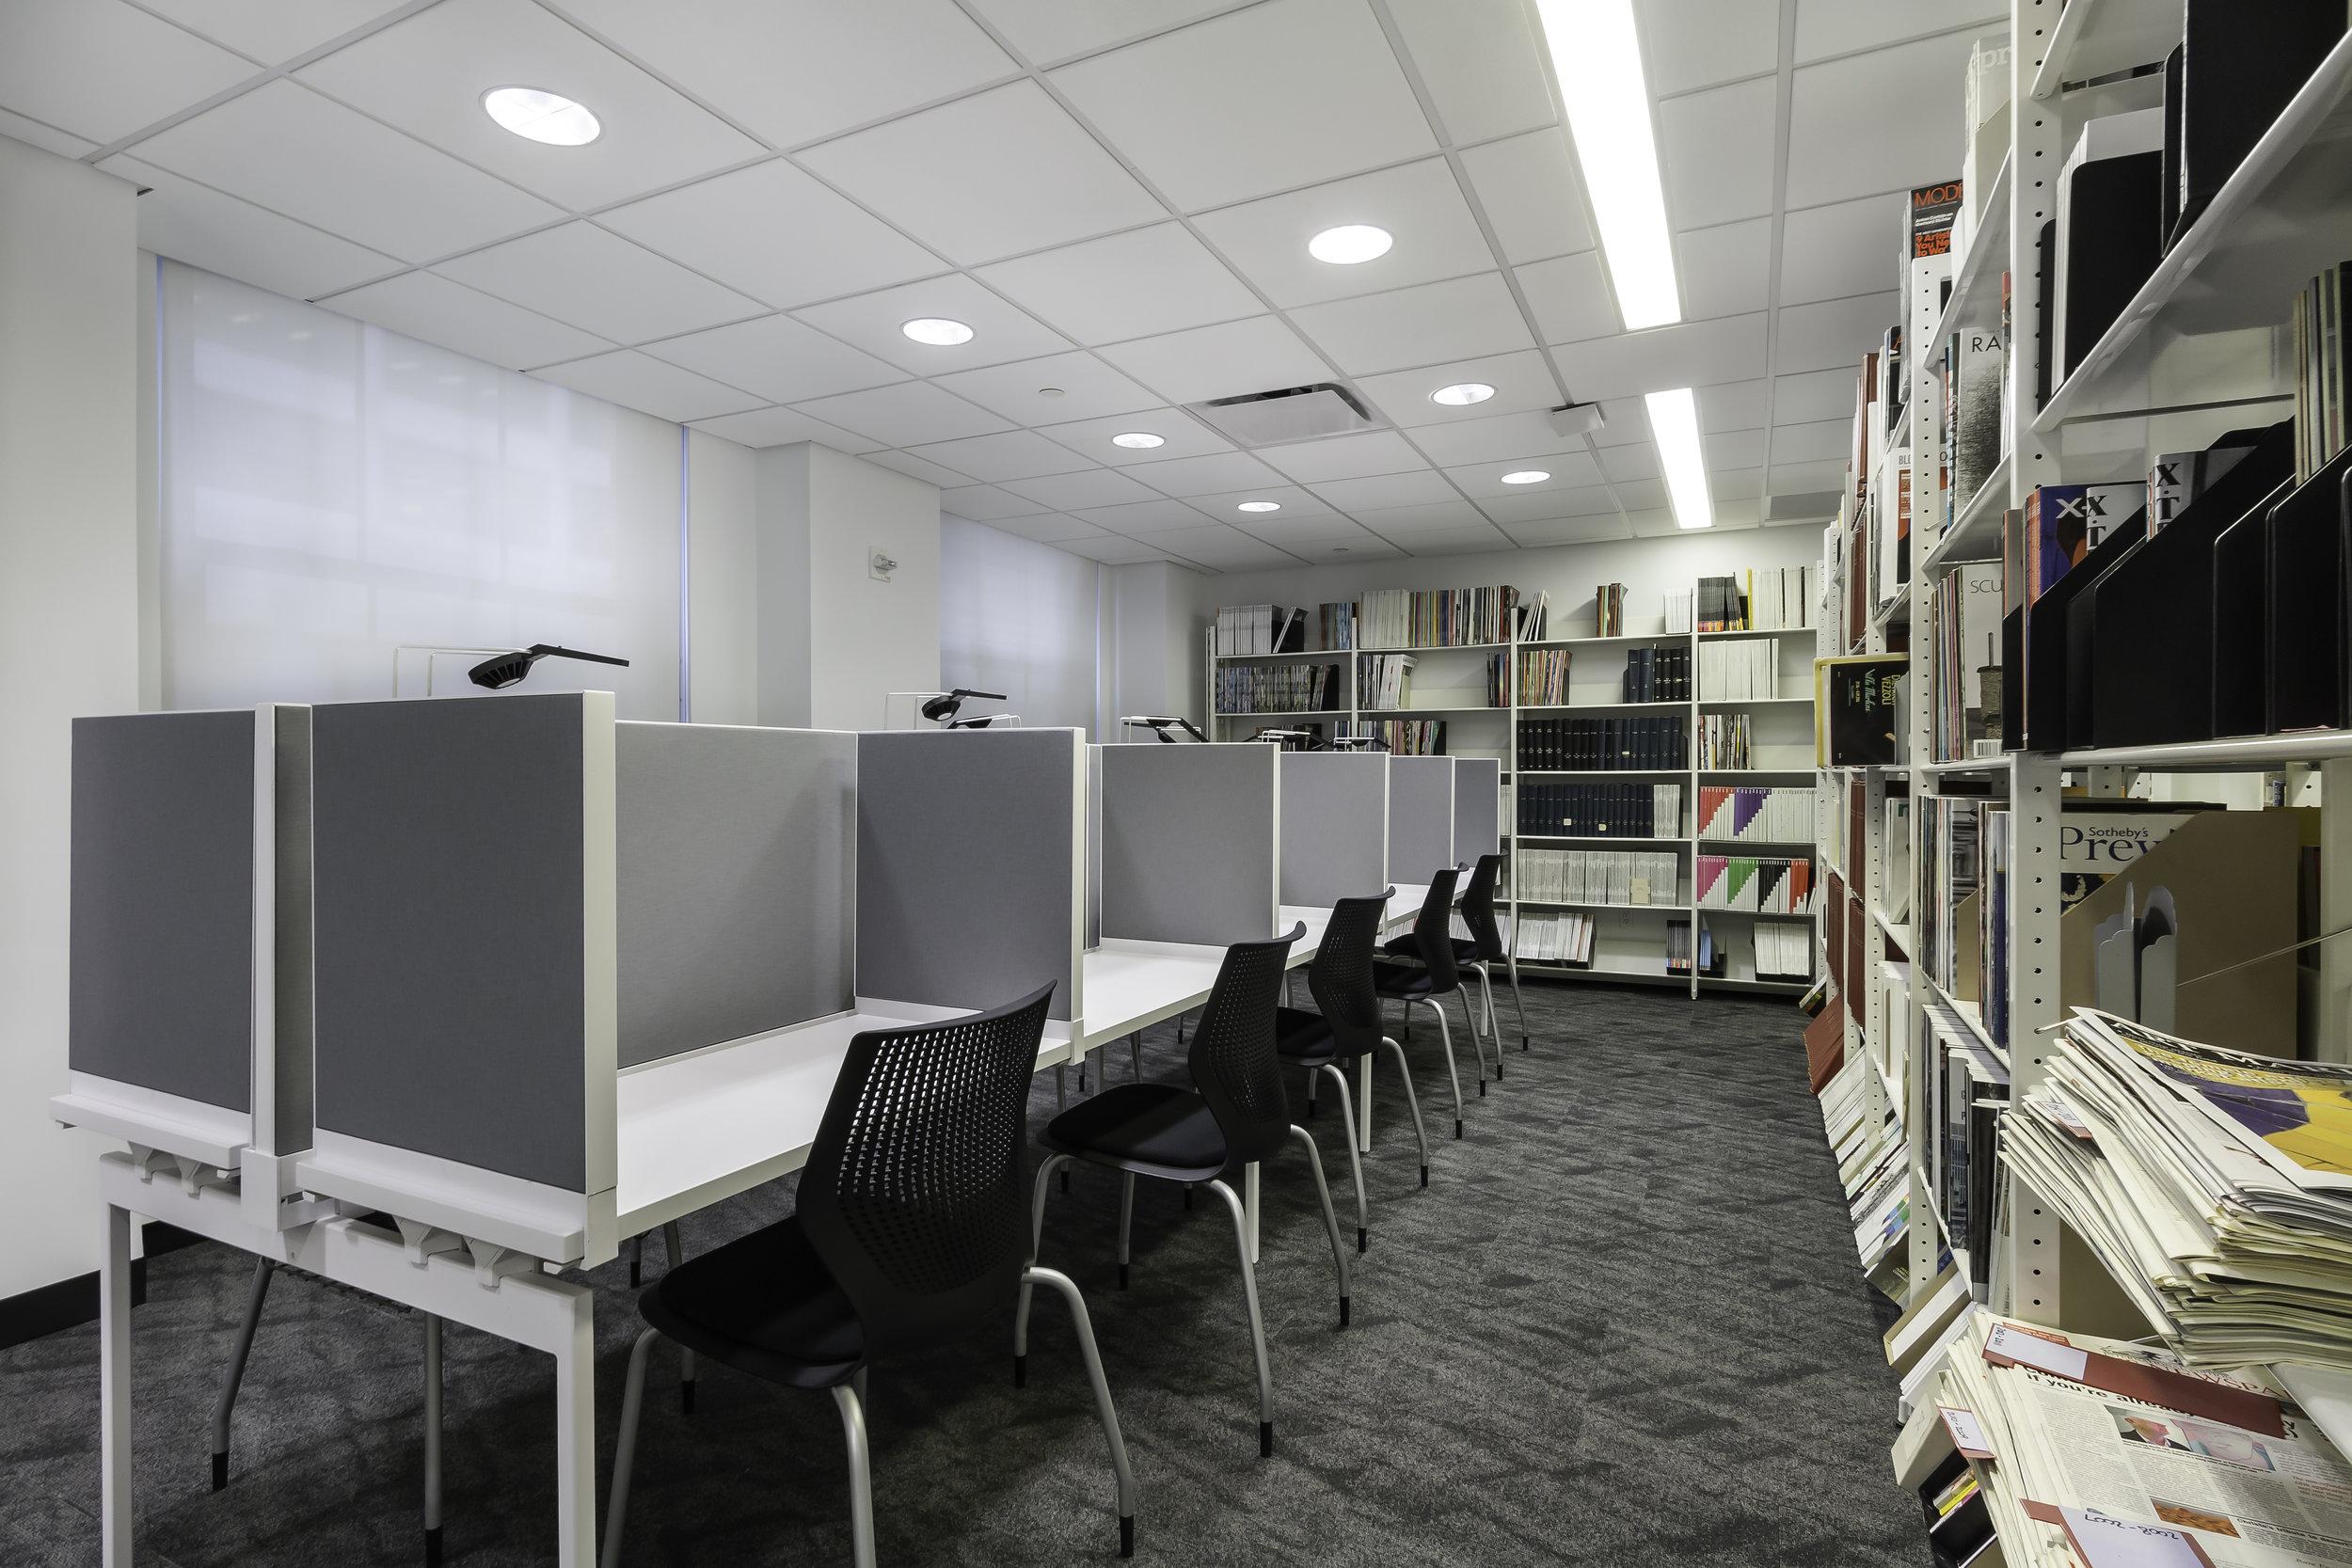 Study.Desks.Library.jpg